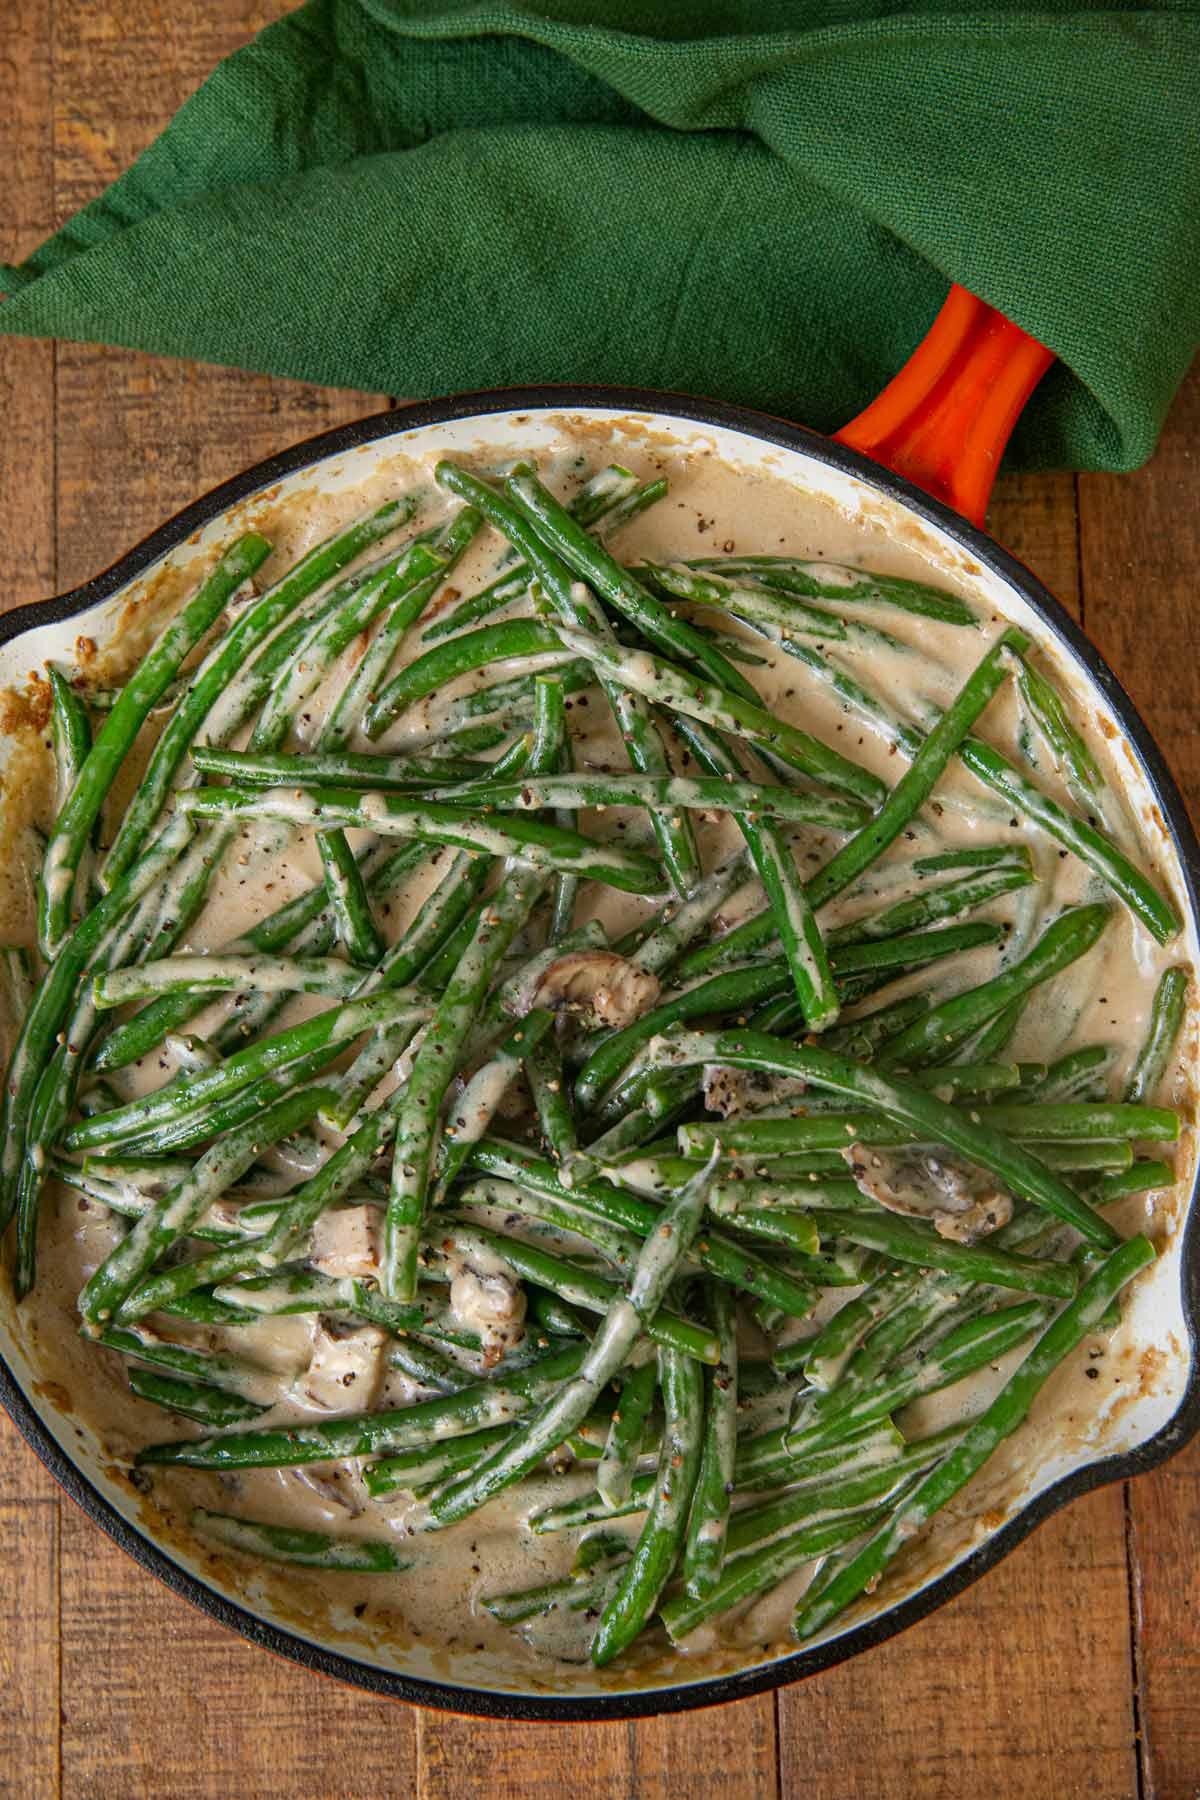 Stovetop Green Bean Casserole in skillet